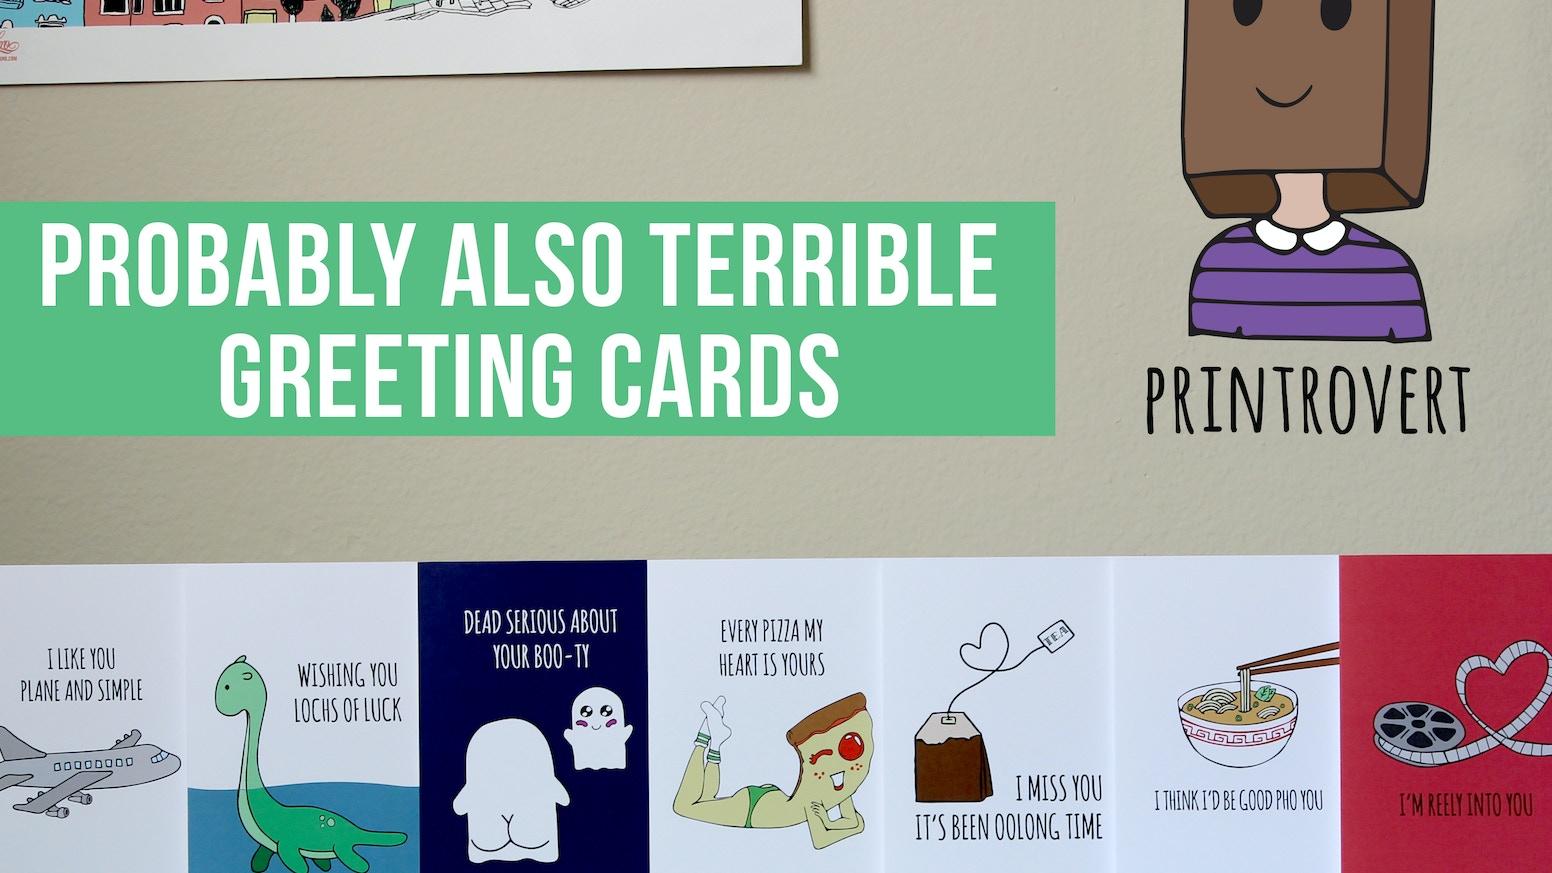 Printrovert Cards Art Prints By Juliet Amsalem Kickstarter